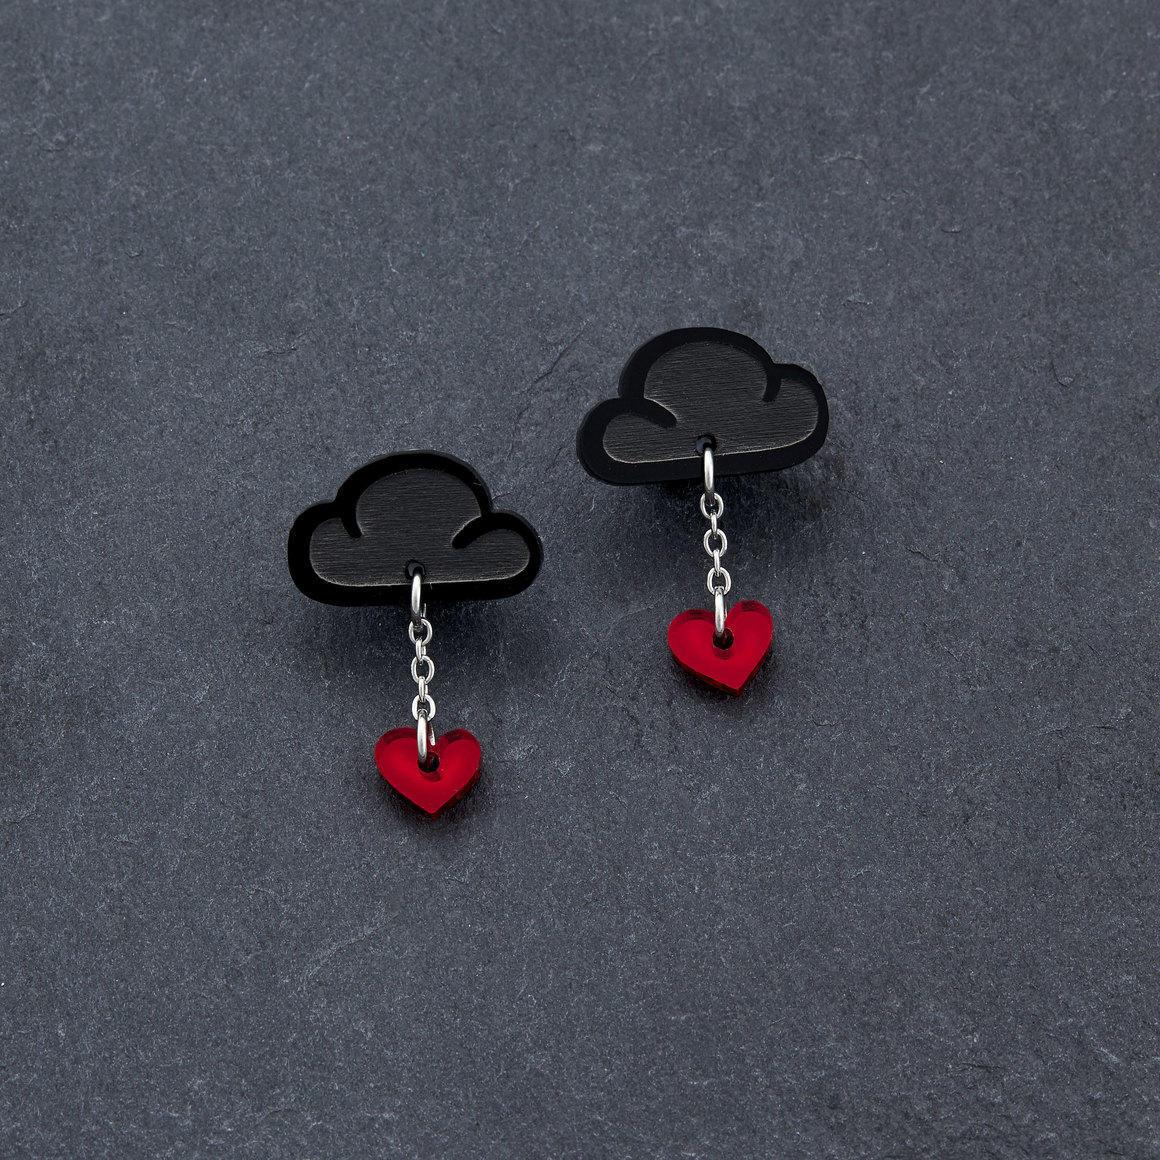 Stud Earrings - LOVE RAINDROPS - Black | Trada Marketplace